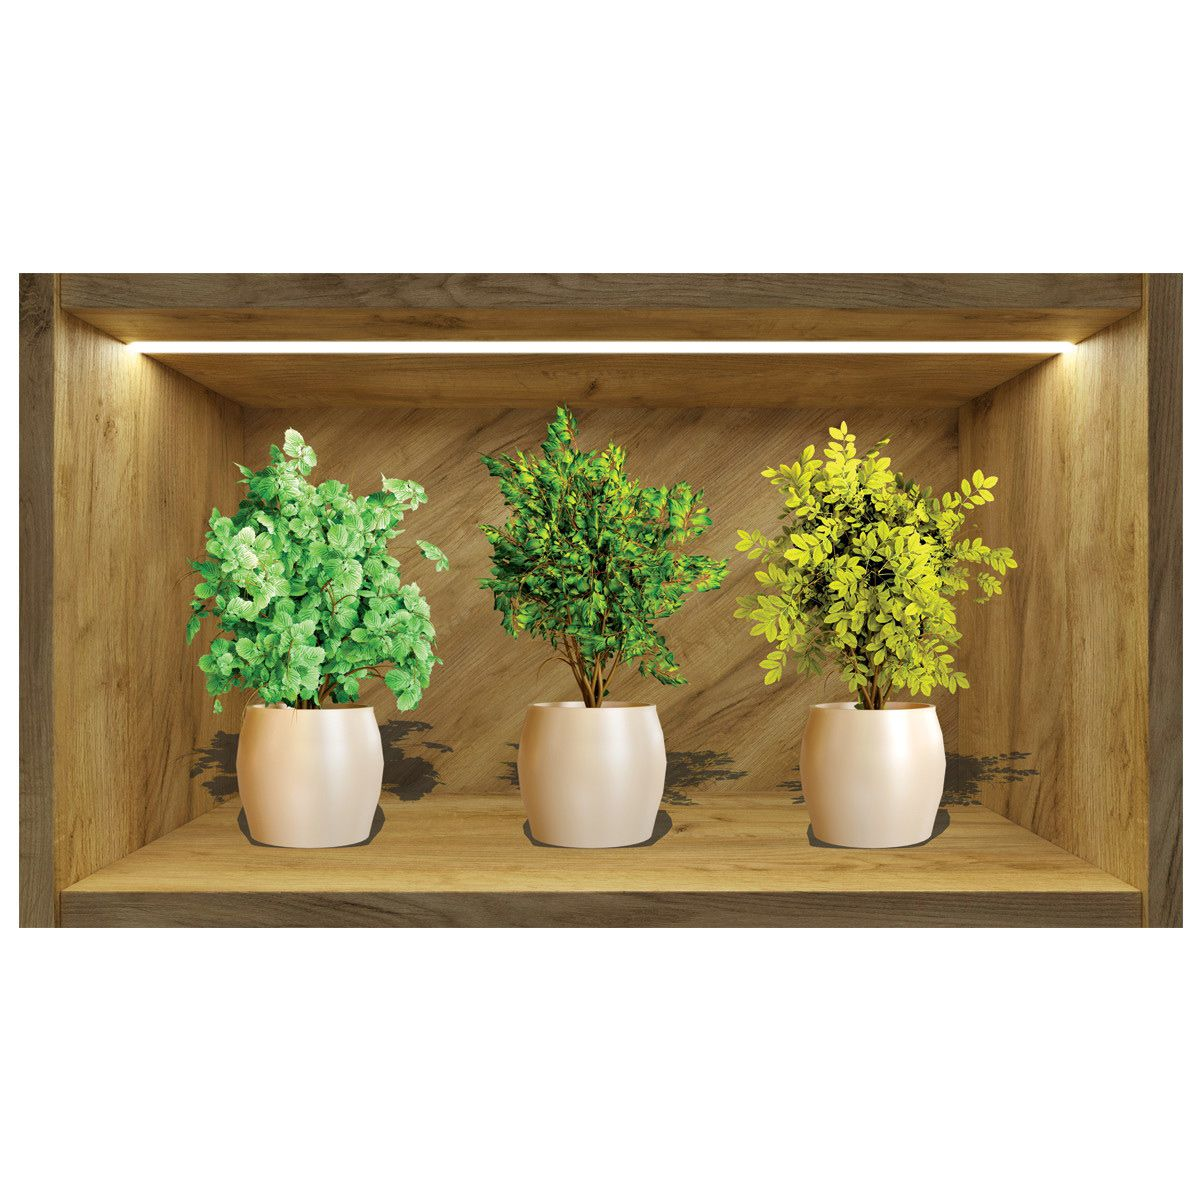 Painel Quadro 3d Nicho Adesivo Vaso Floral Exclusividade Mod1